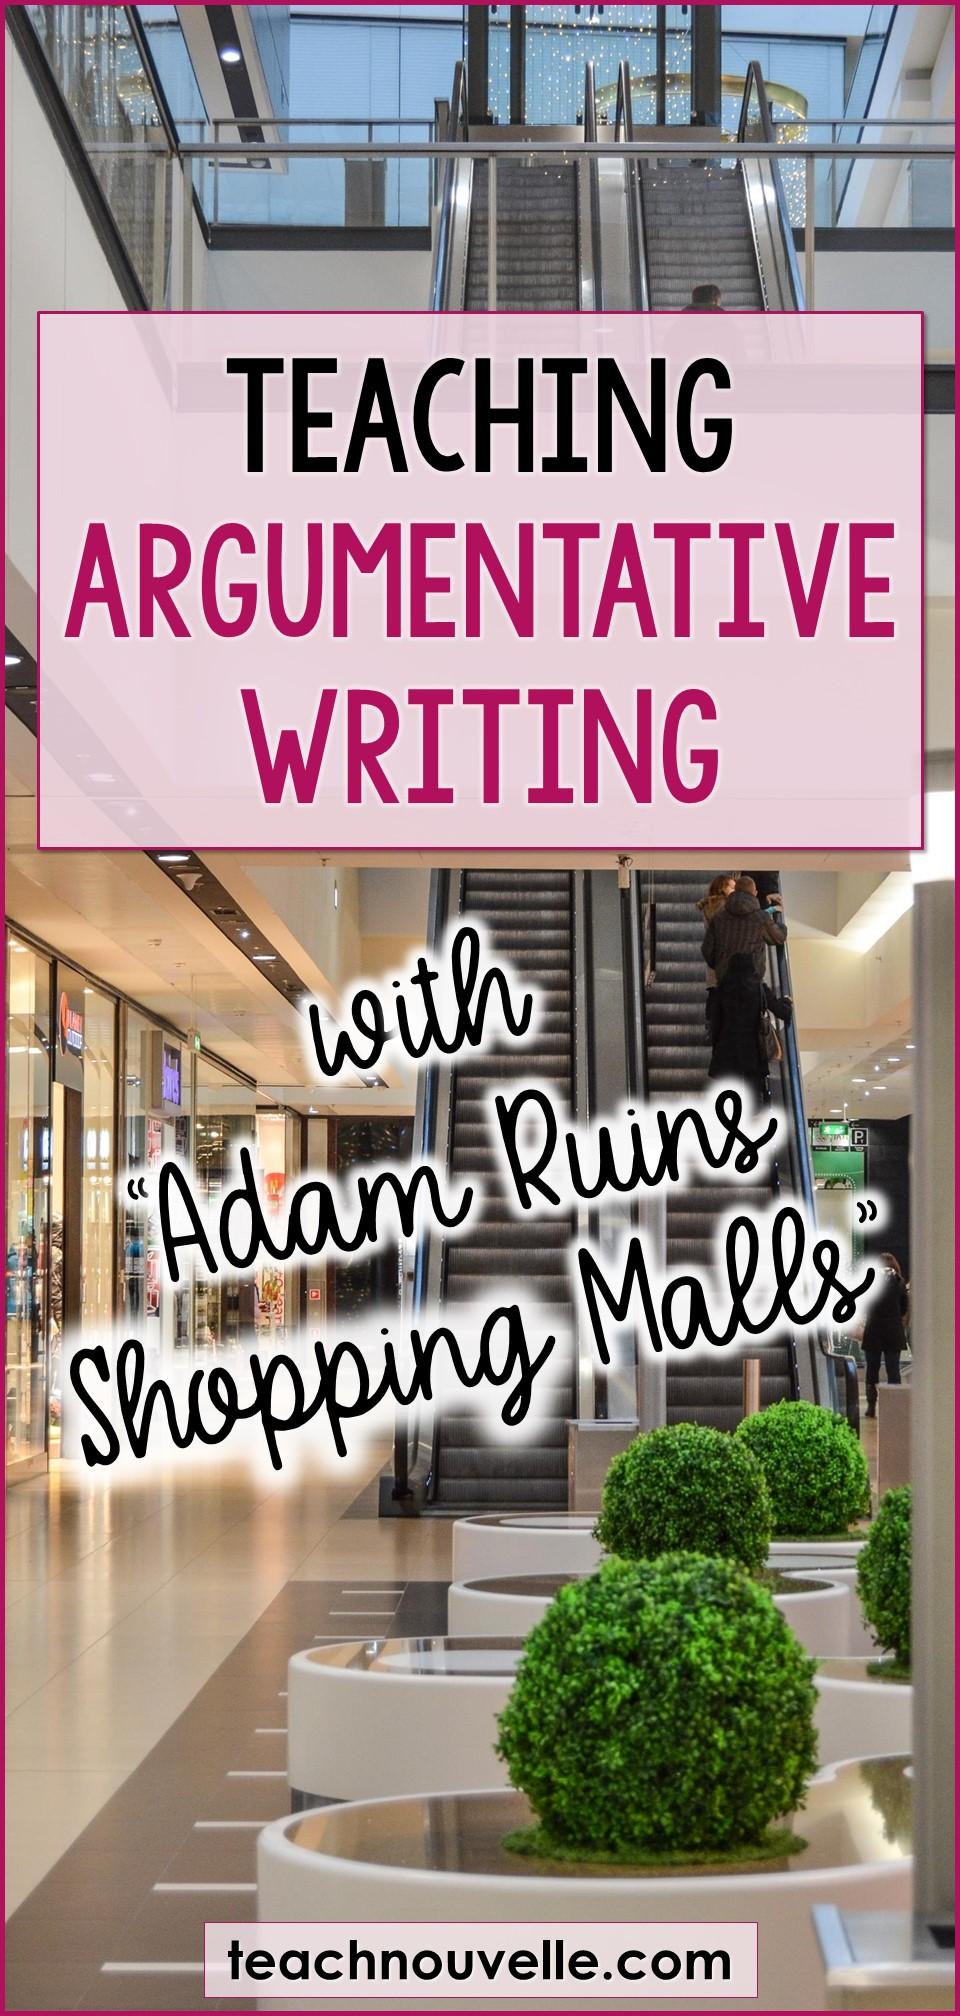 Teaching Argumentative Writing with Adam Ruins Everything pin